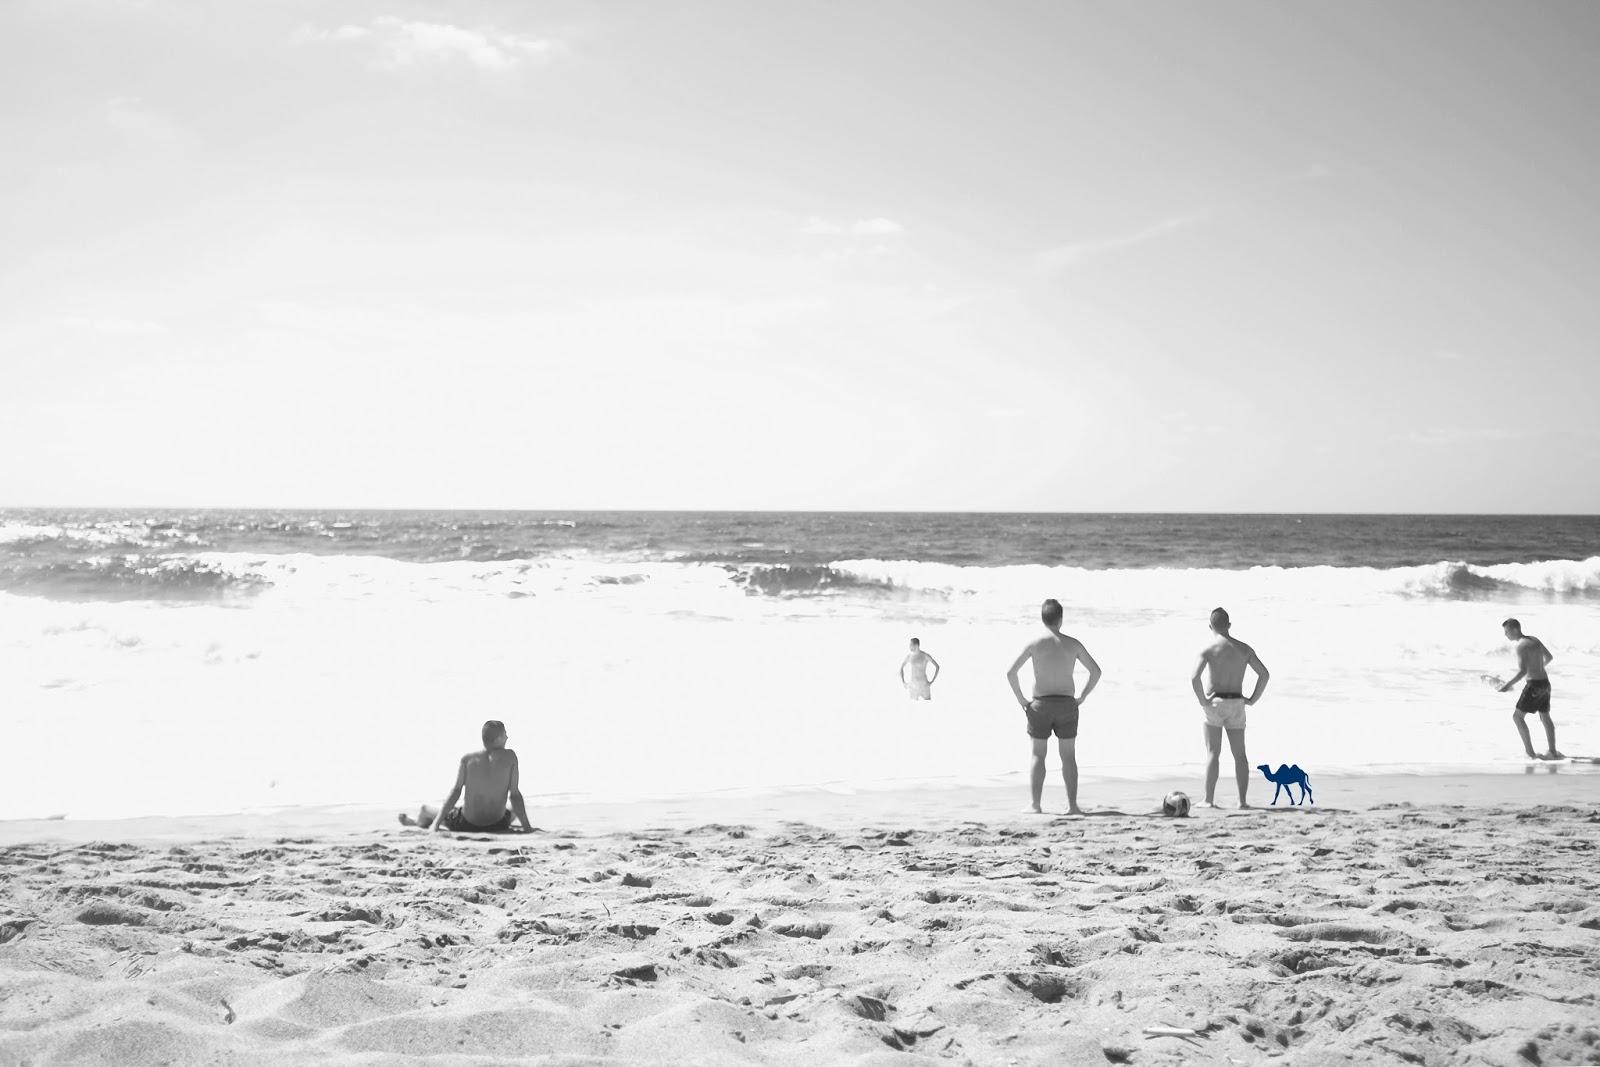 Le Chameau Bleu - Spiaggia di Porte Alabe - Vague